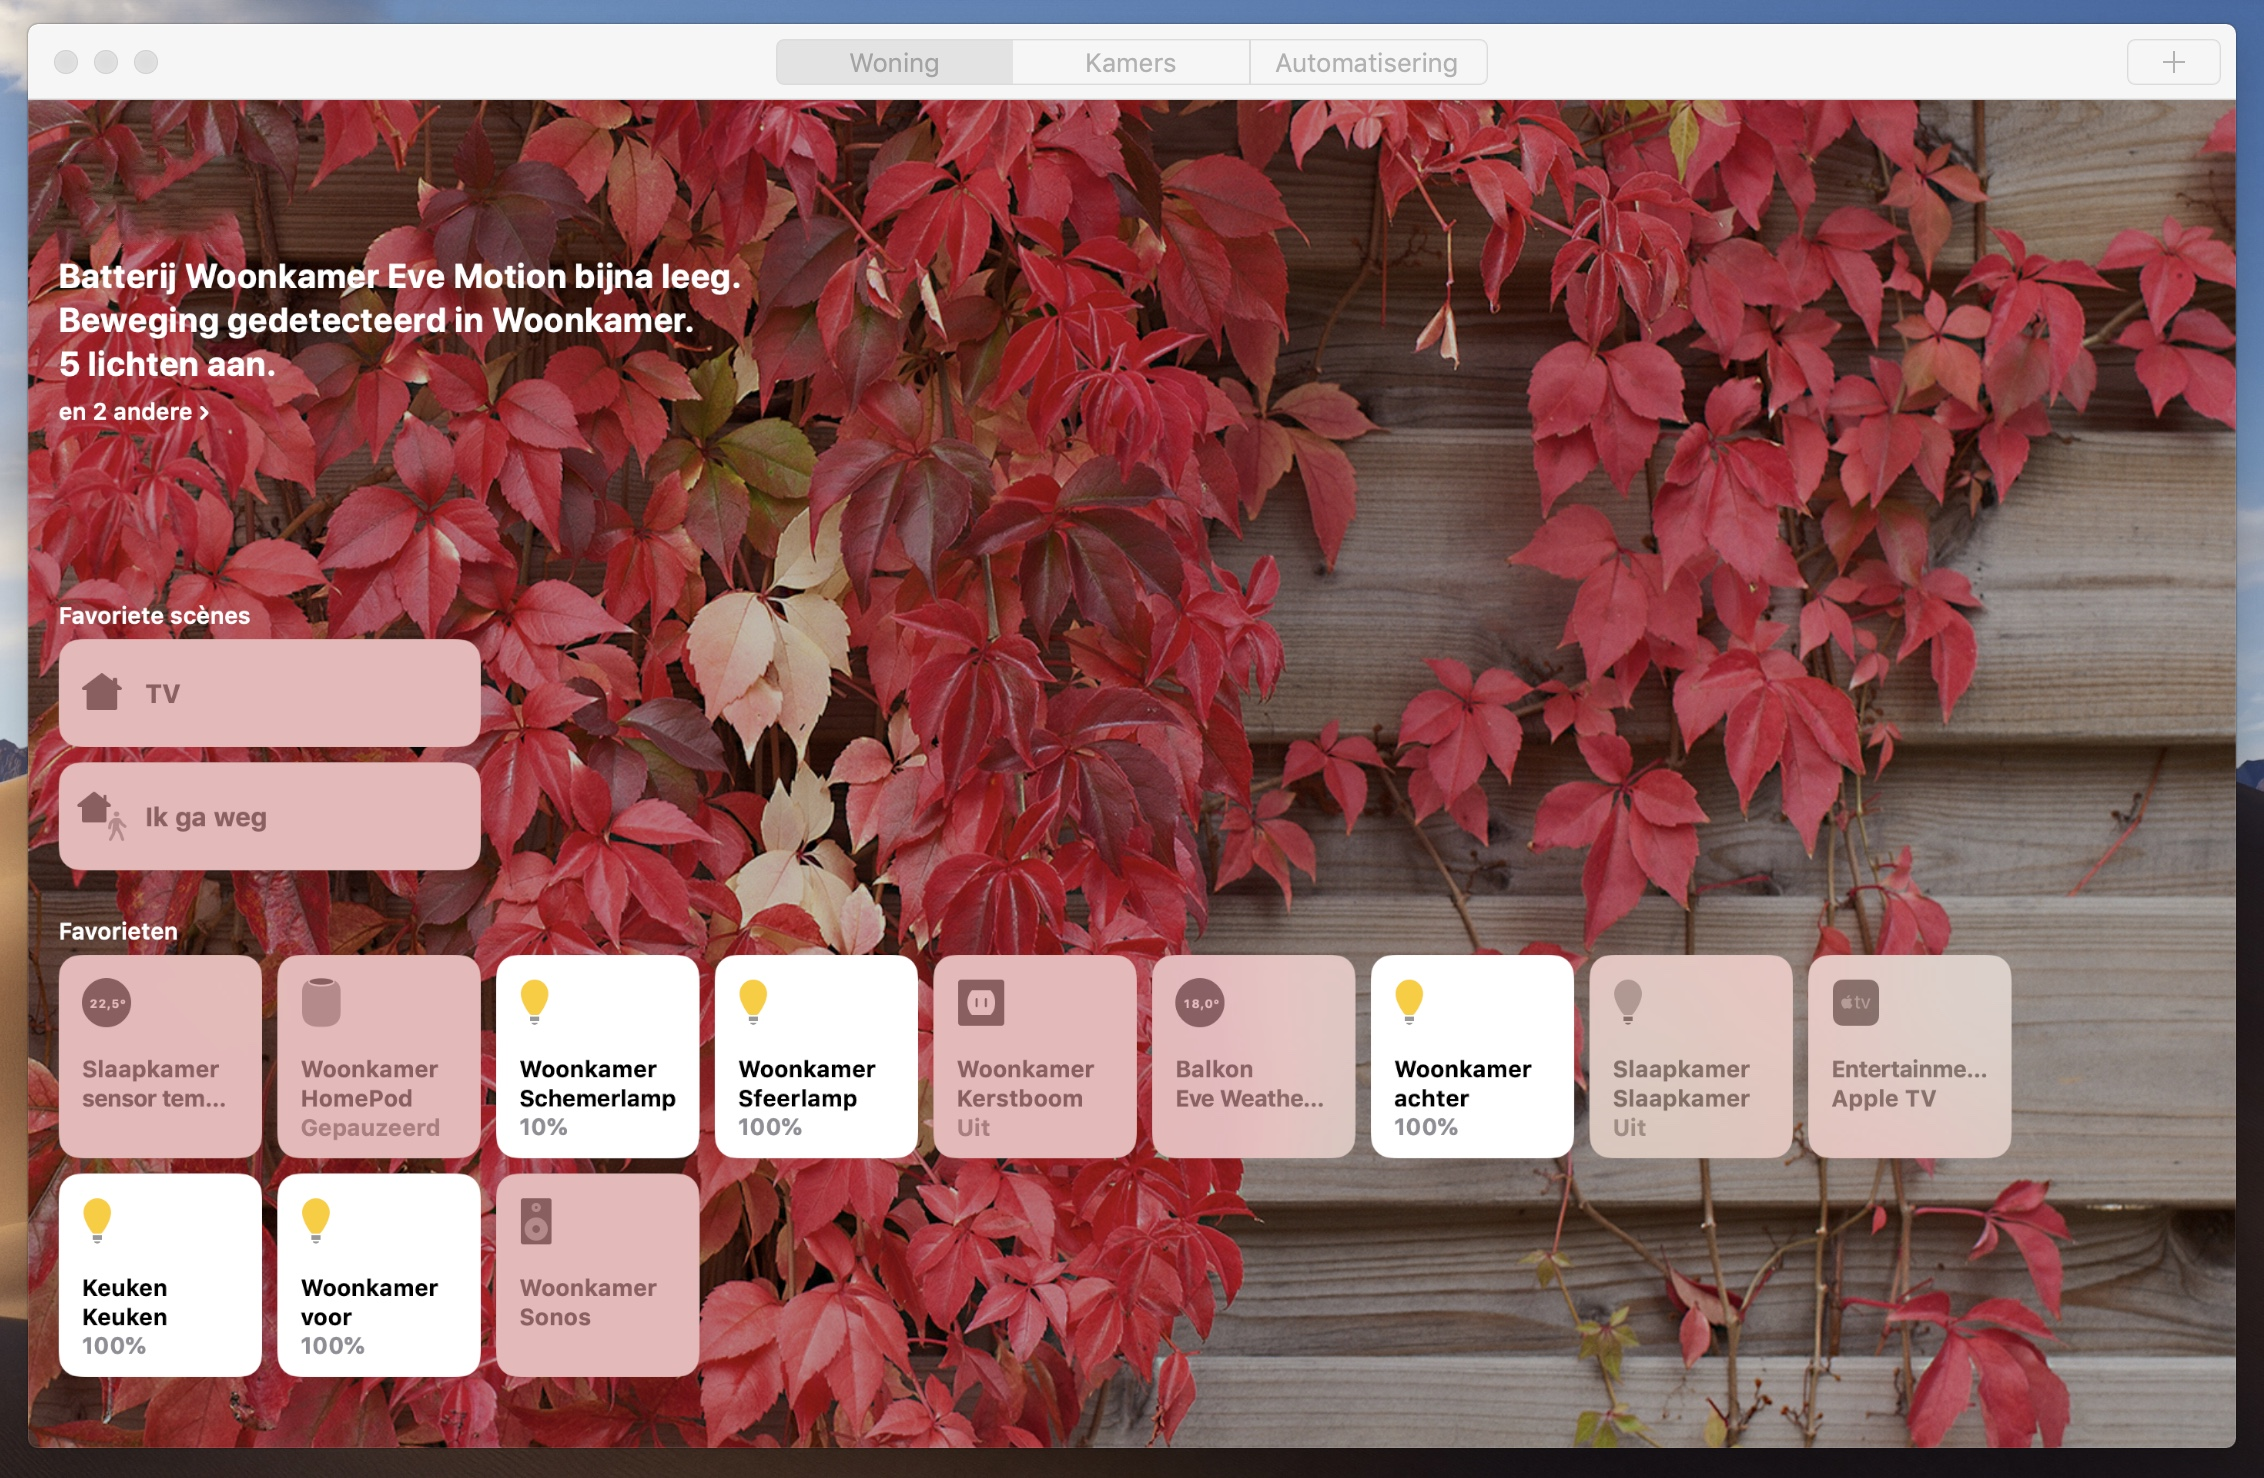 Woning-app macOS Mojave HomeKit